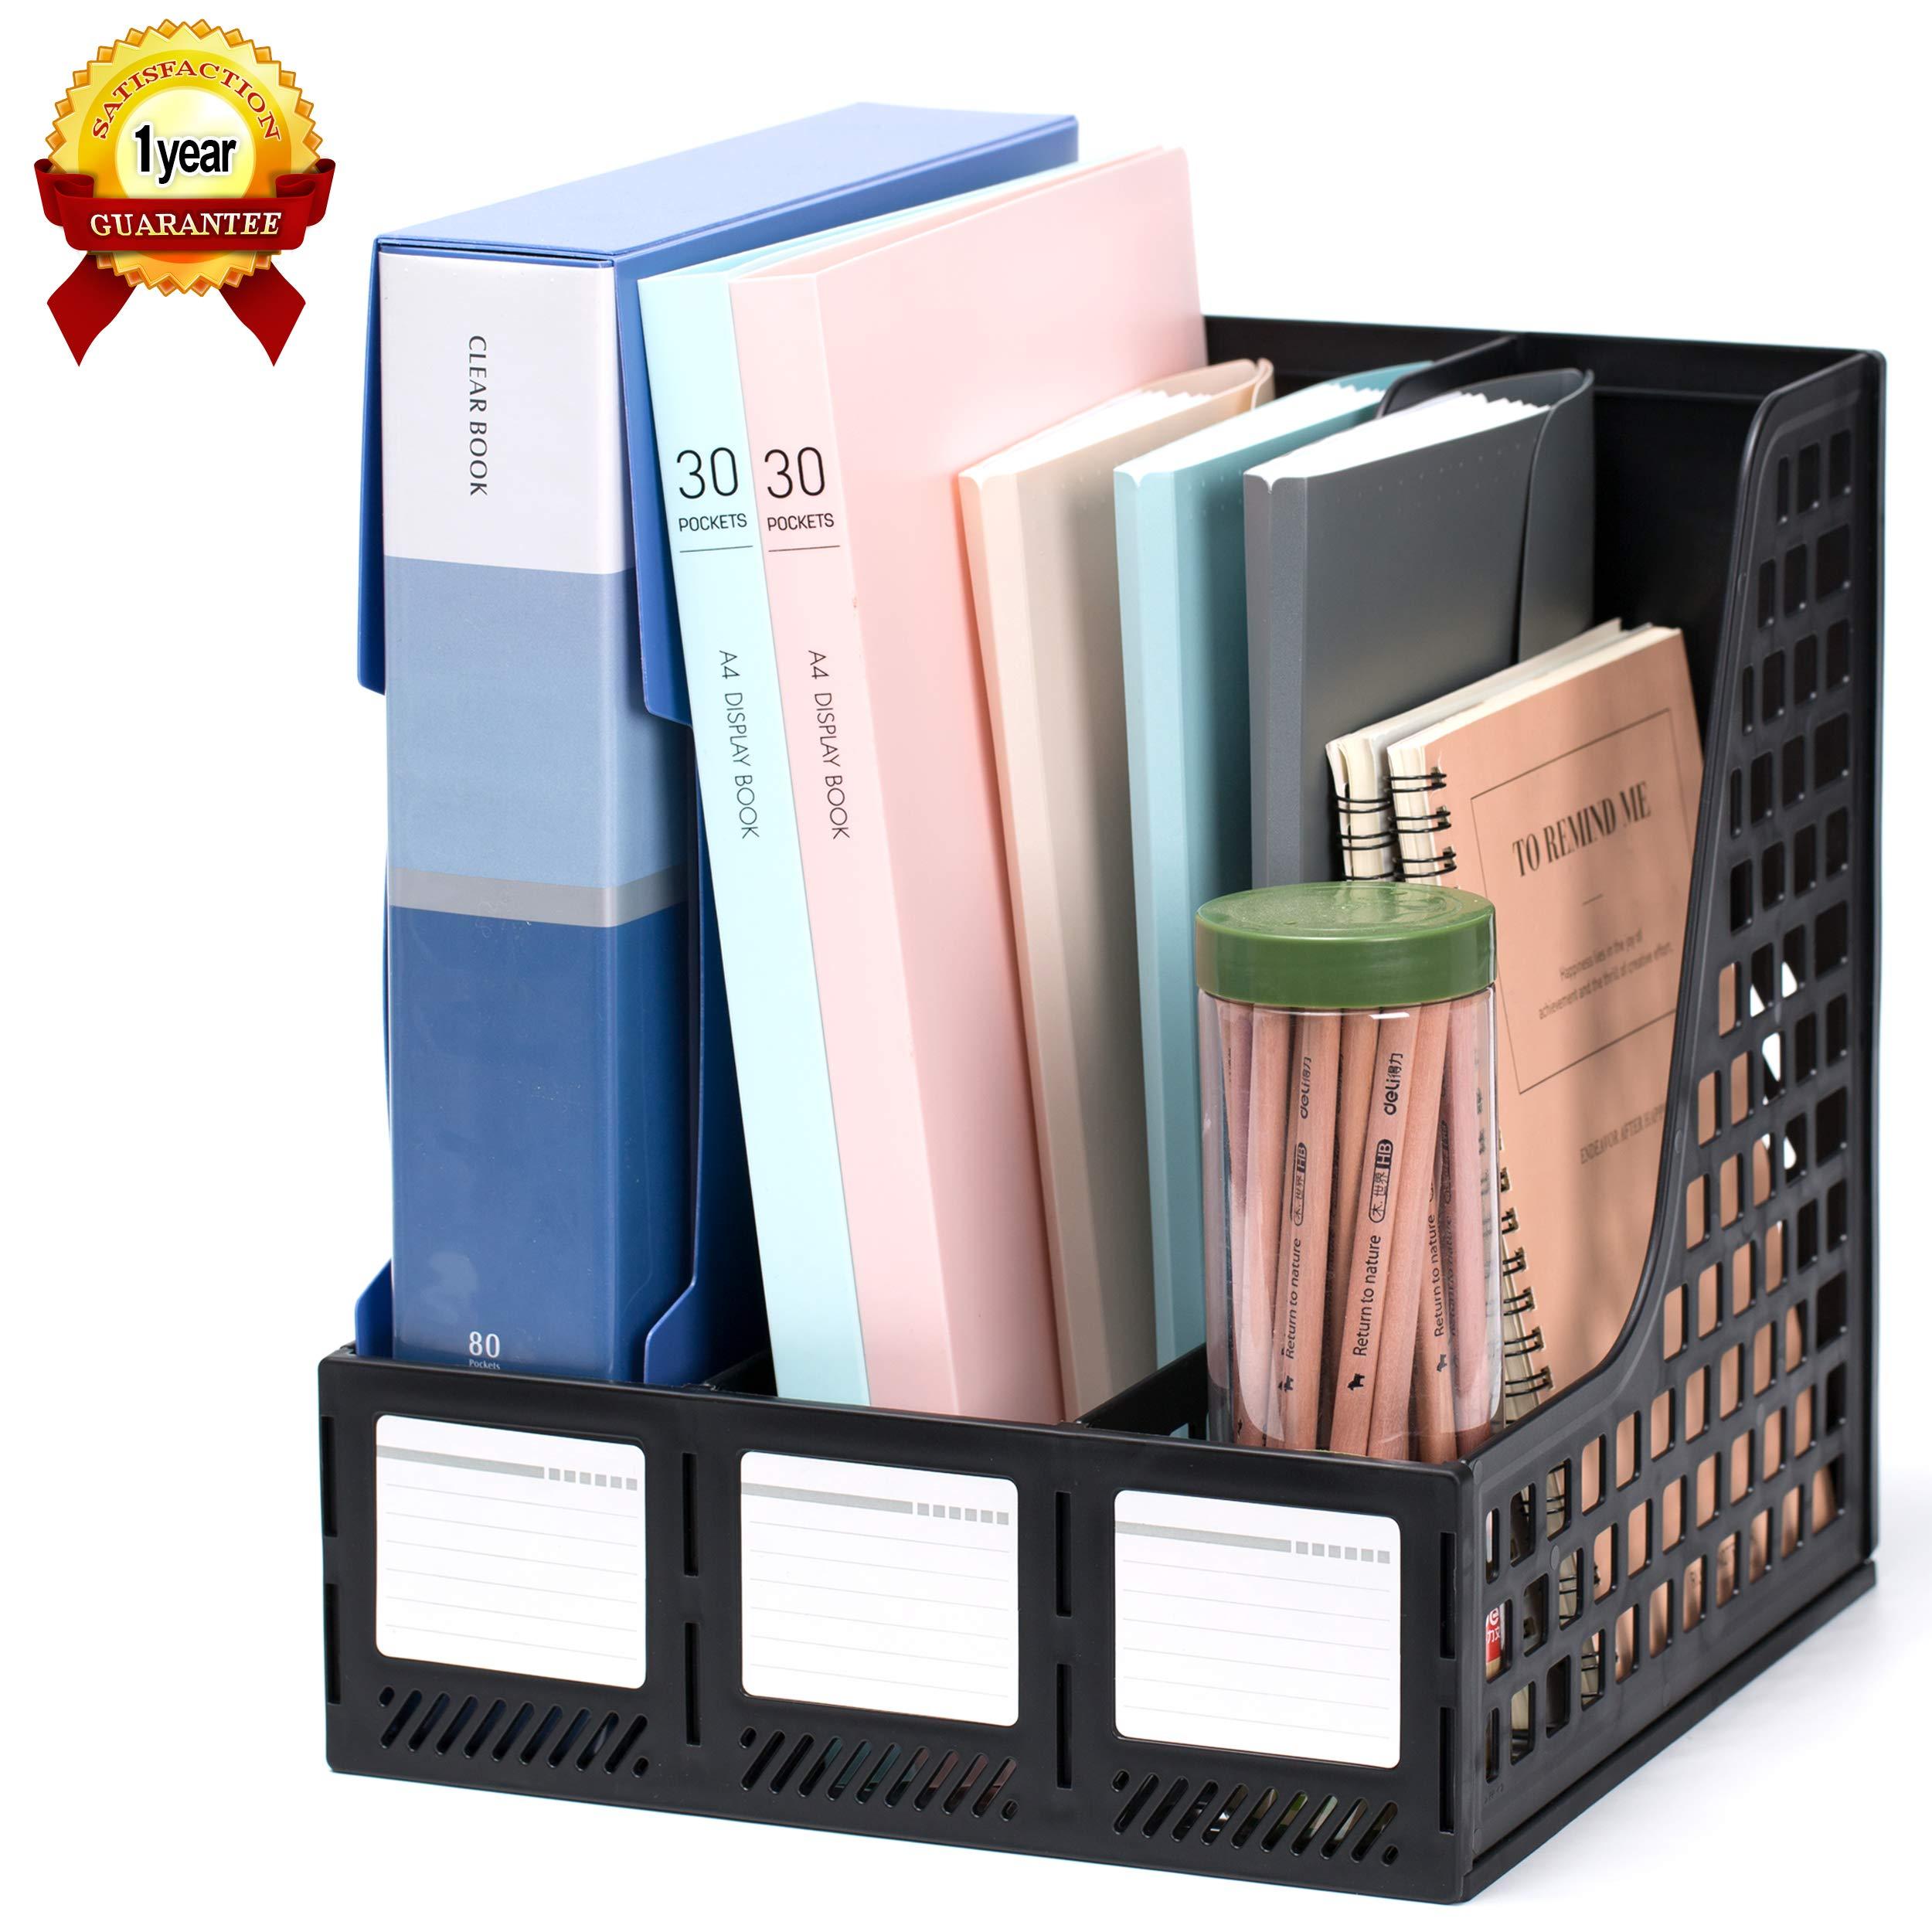 Leven Sturdy Magazine File Holder Desk Organizer File Folder for Office Organization and Storage with 3 Vertical Compartments, File-Storage-Organizer-Magazine-Holder